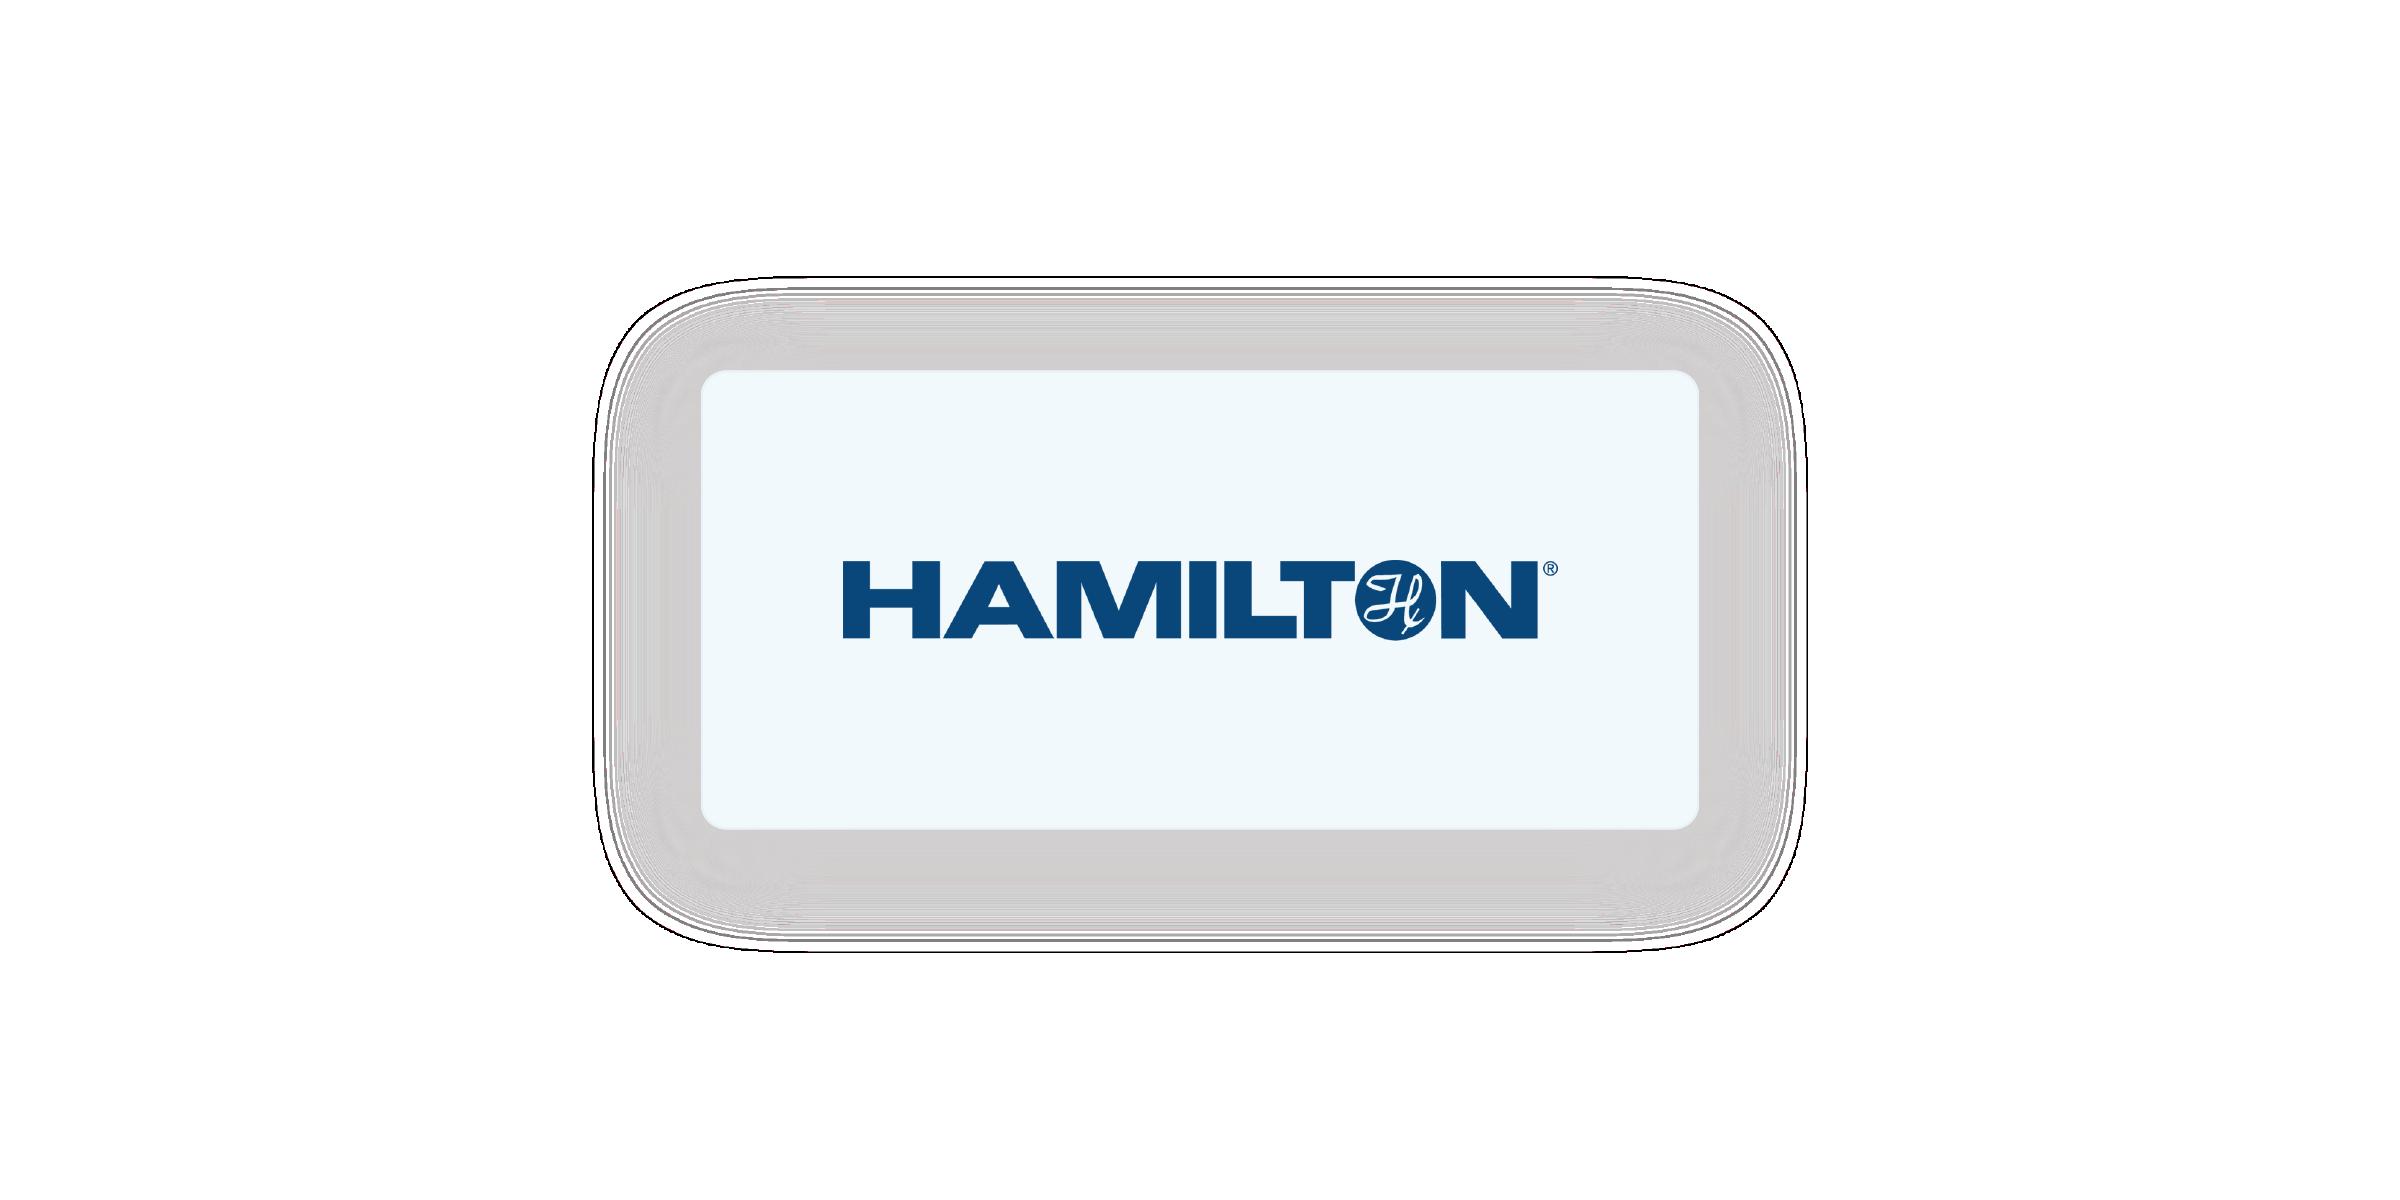 Hamilton & UgenTec partnership